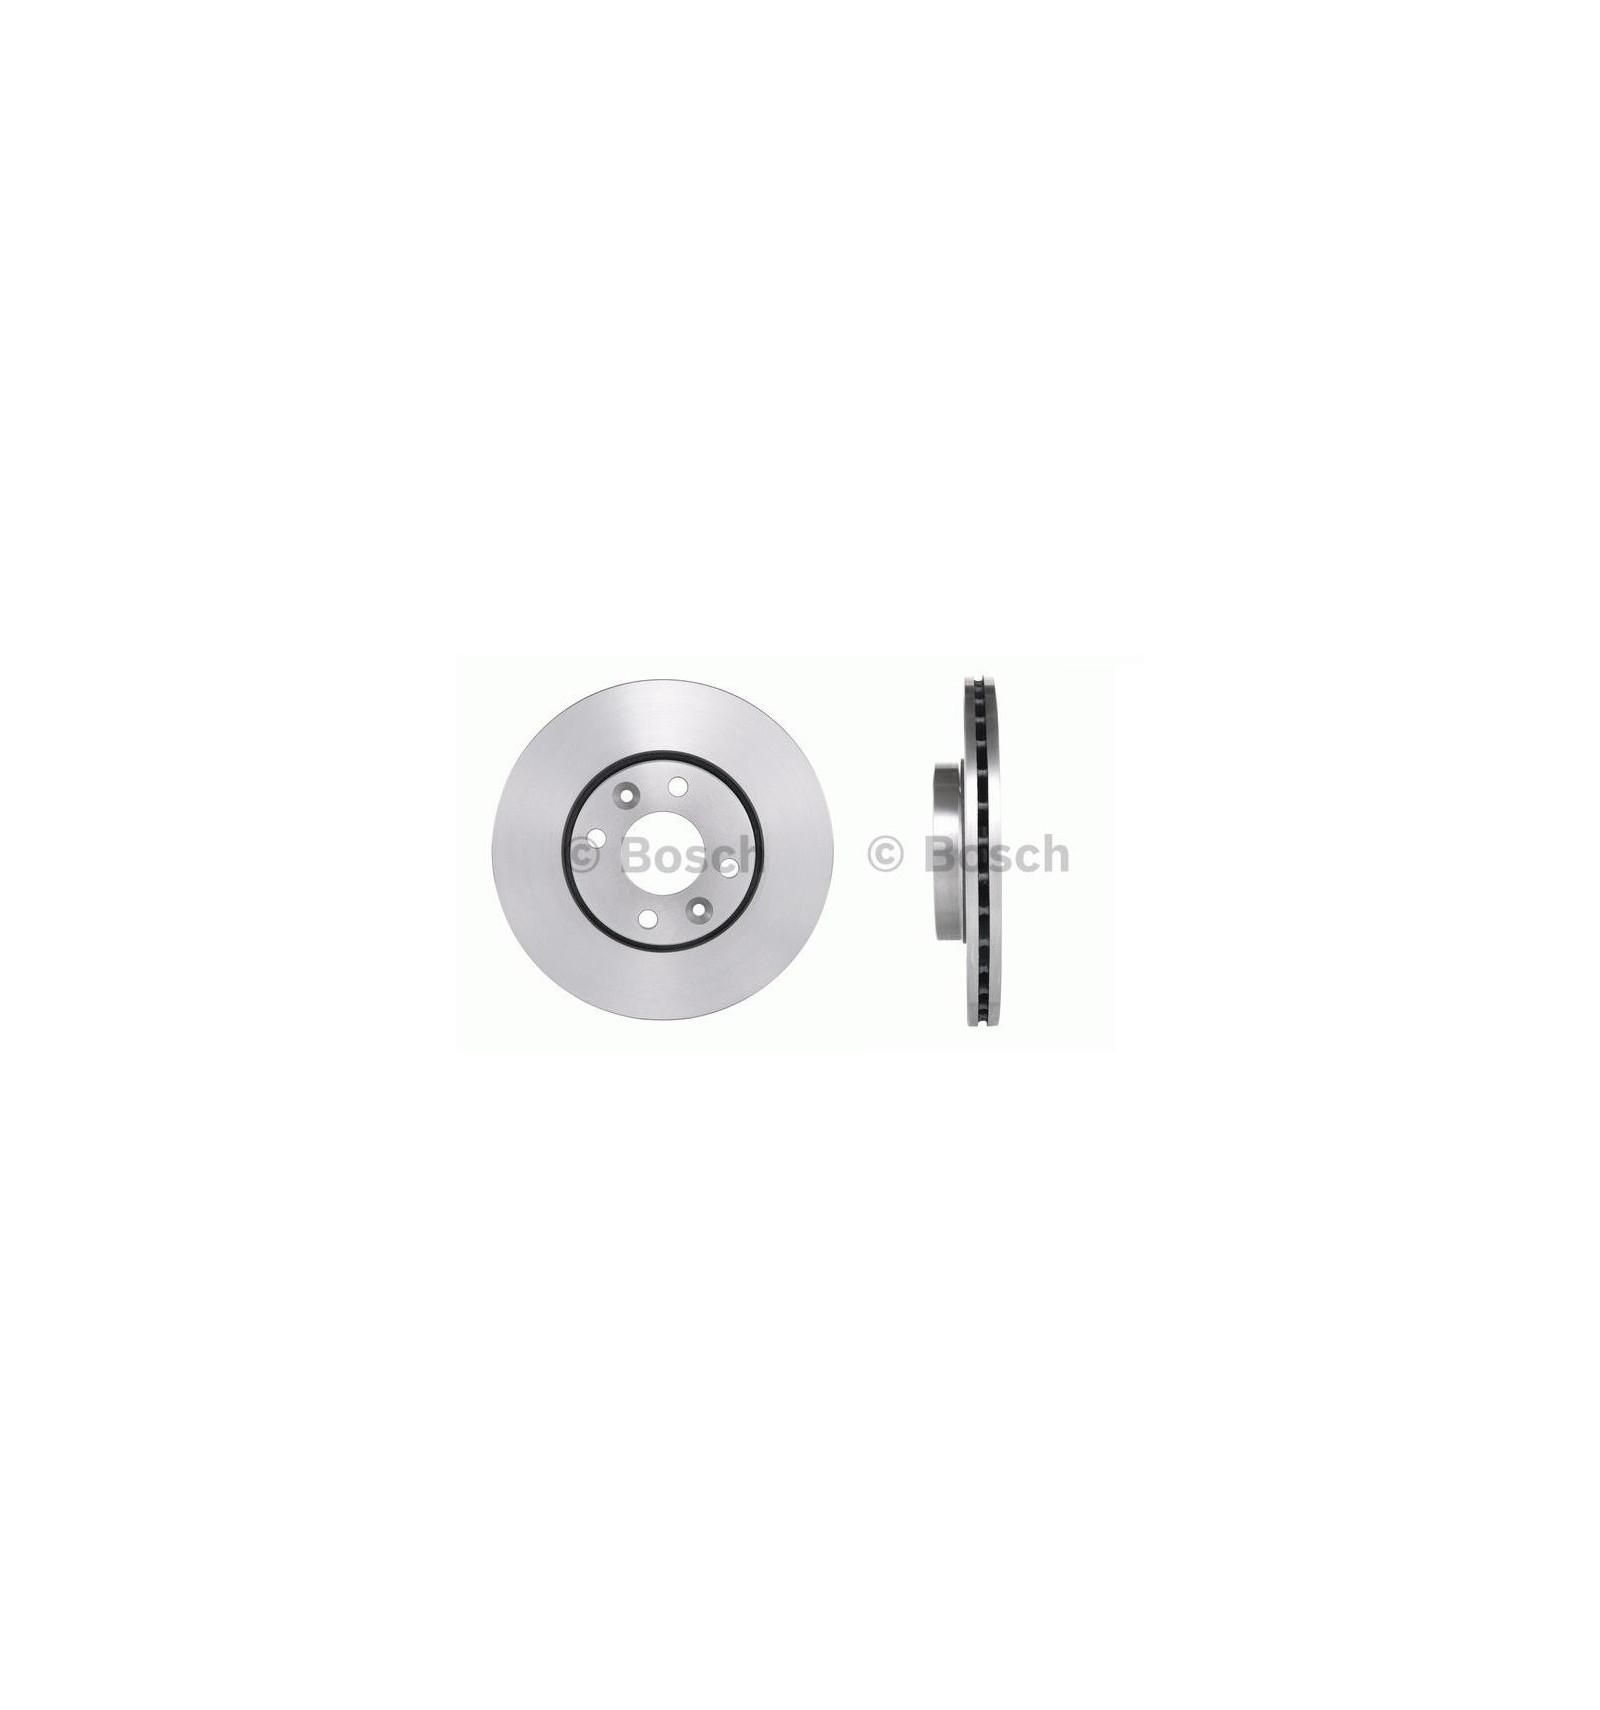 disques de freins avant dacia logan nissan micra note renault clio 3 megane 2 modus bosch. Black Bedroom Furniture Sets. Home Design Ideas